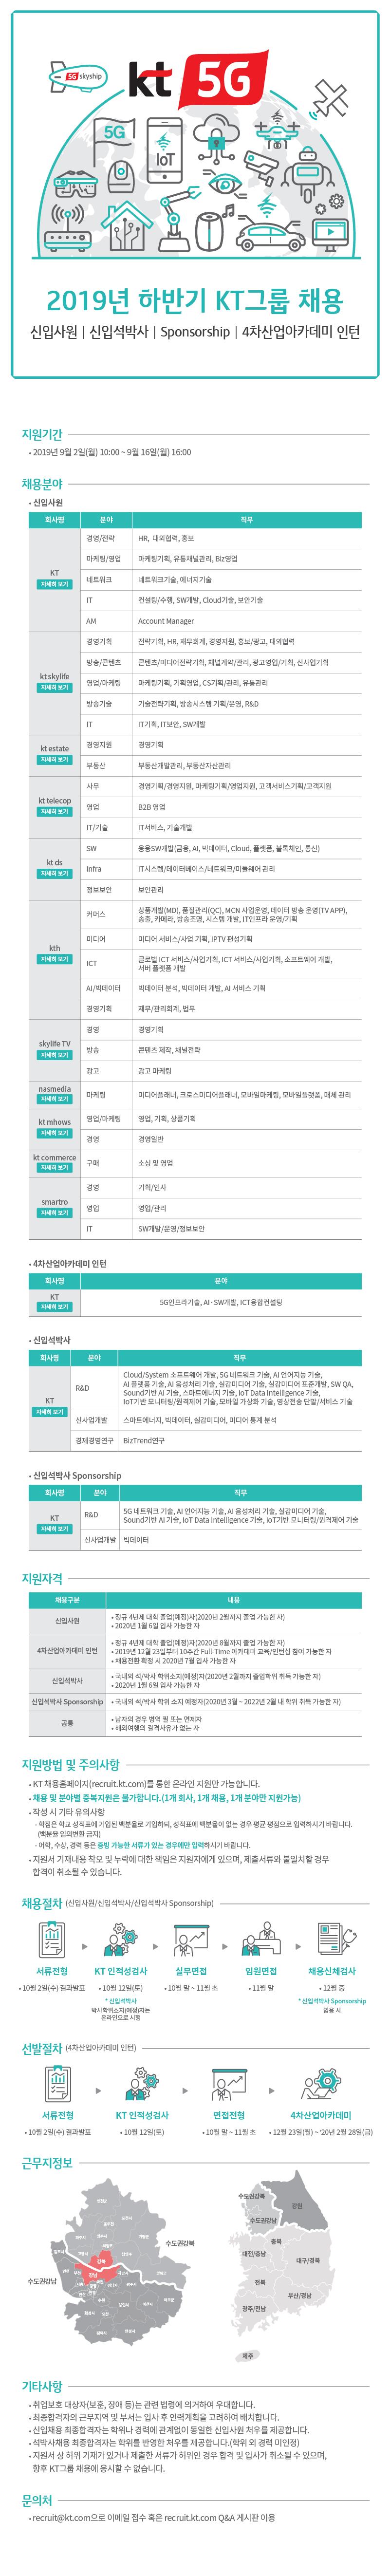 ㈜KT 2019년 하반기 KT그룹 채용